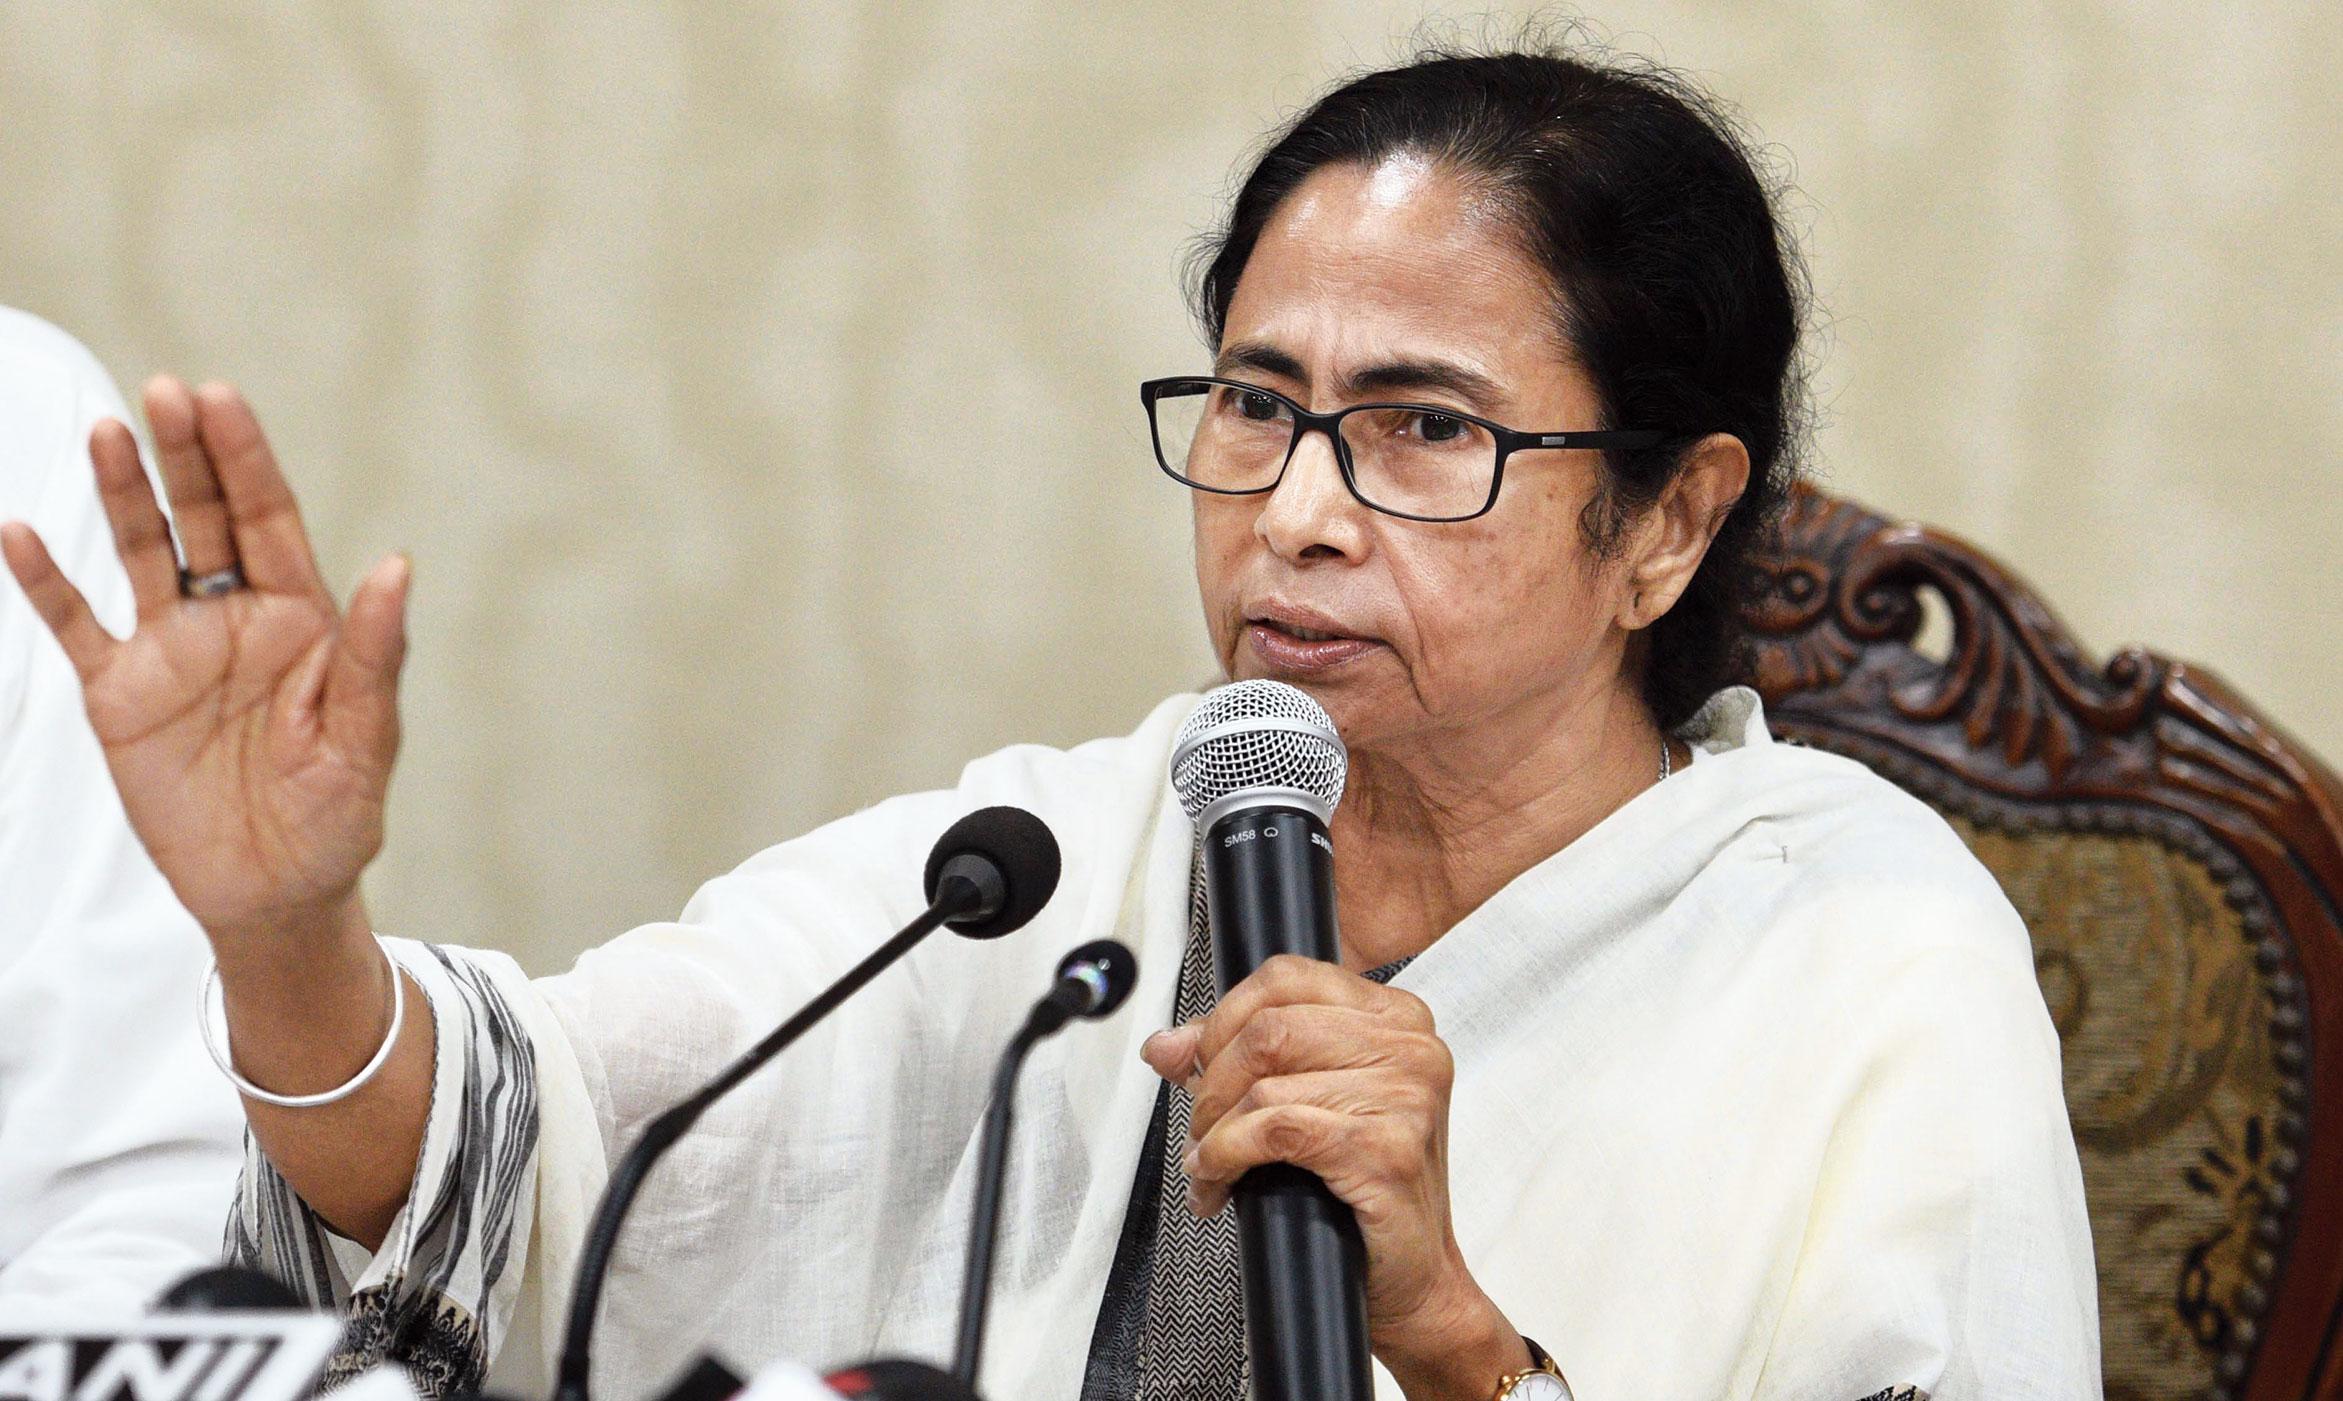 Mamata Banerjee at the news conference in Nabanna, Calcutta.